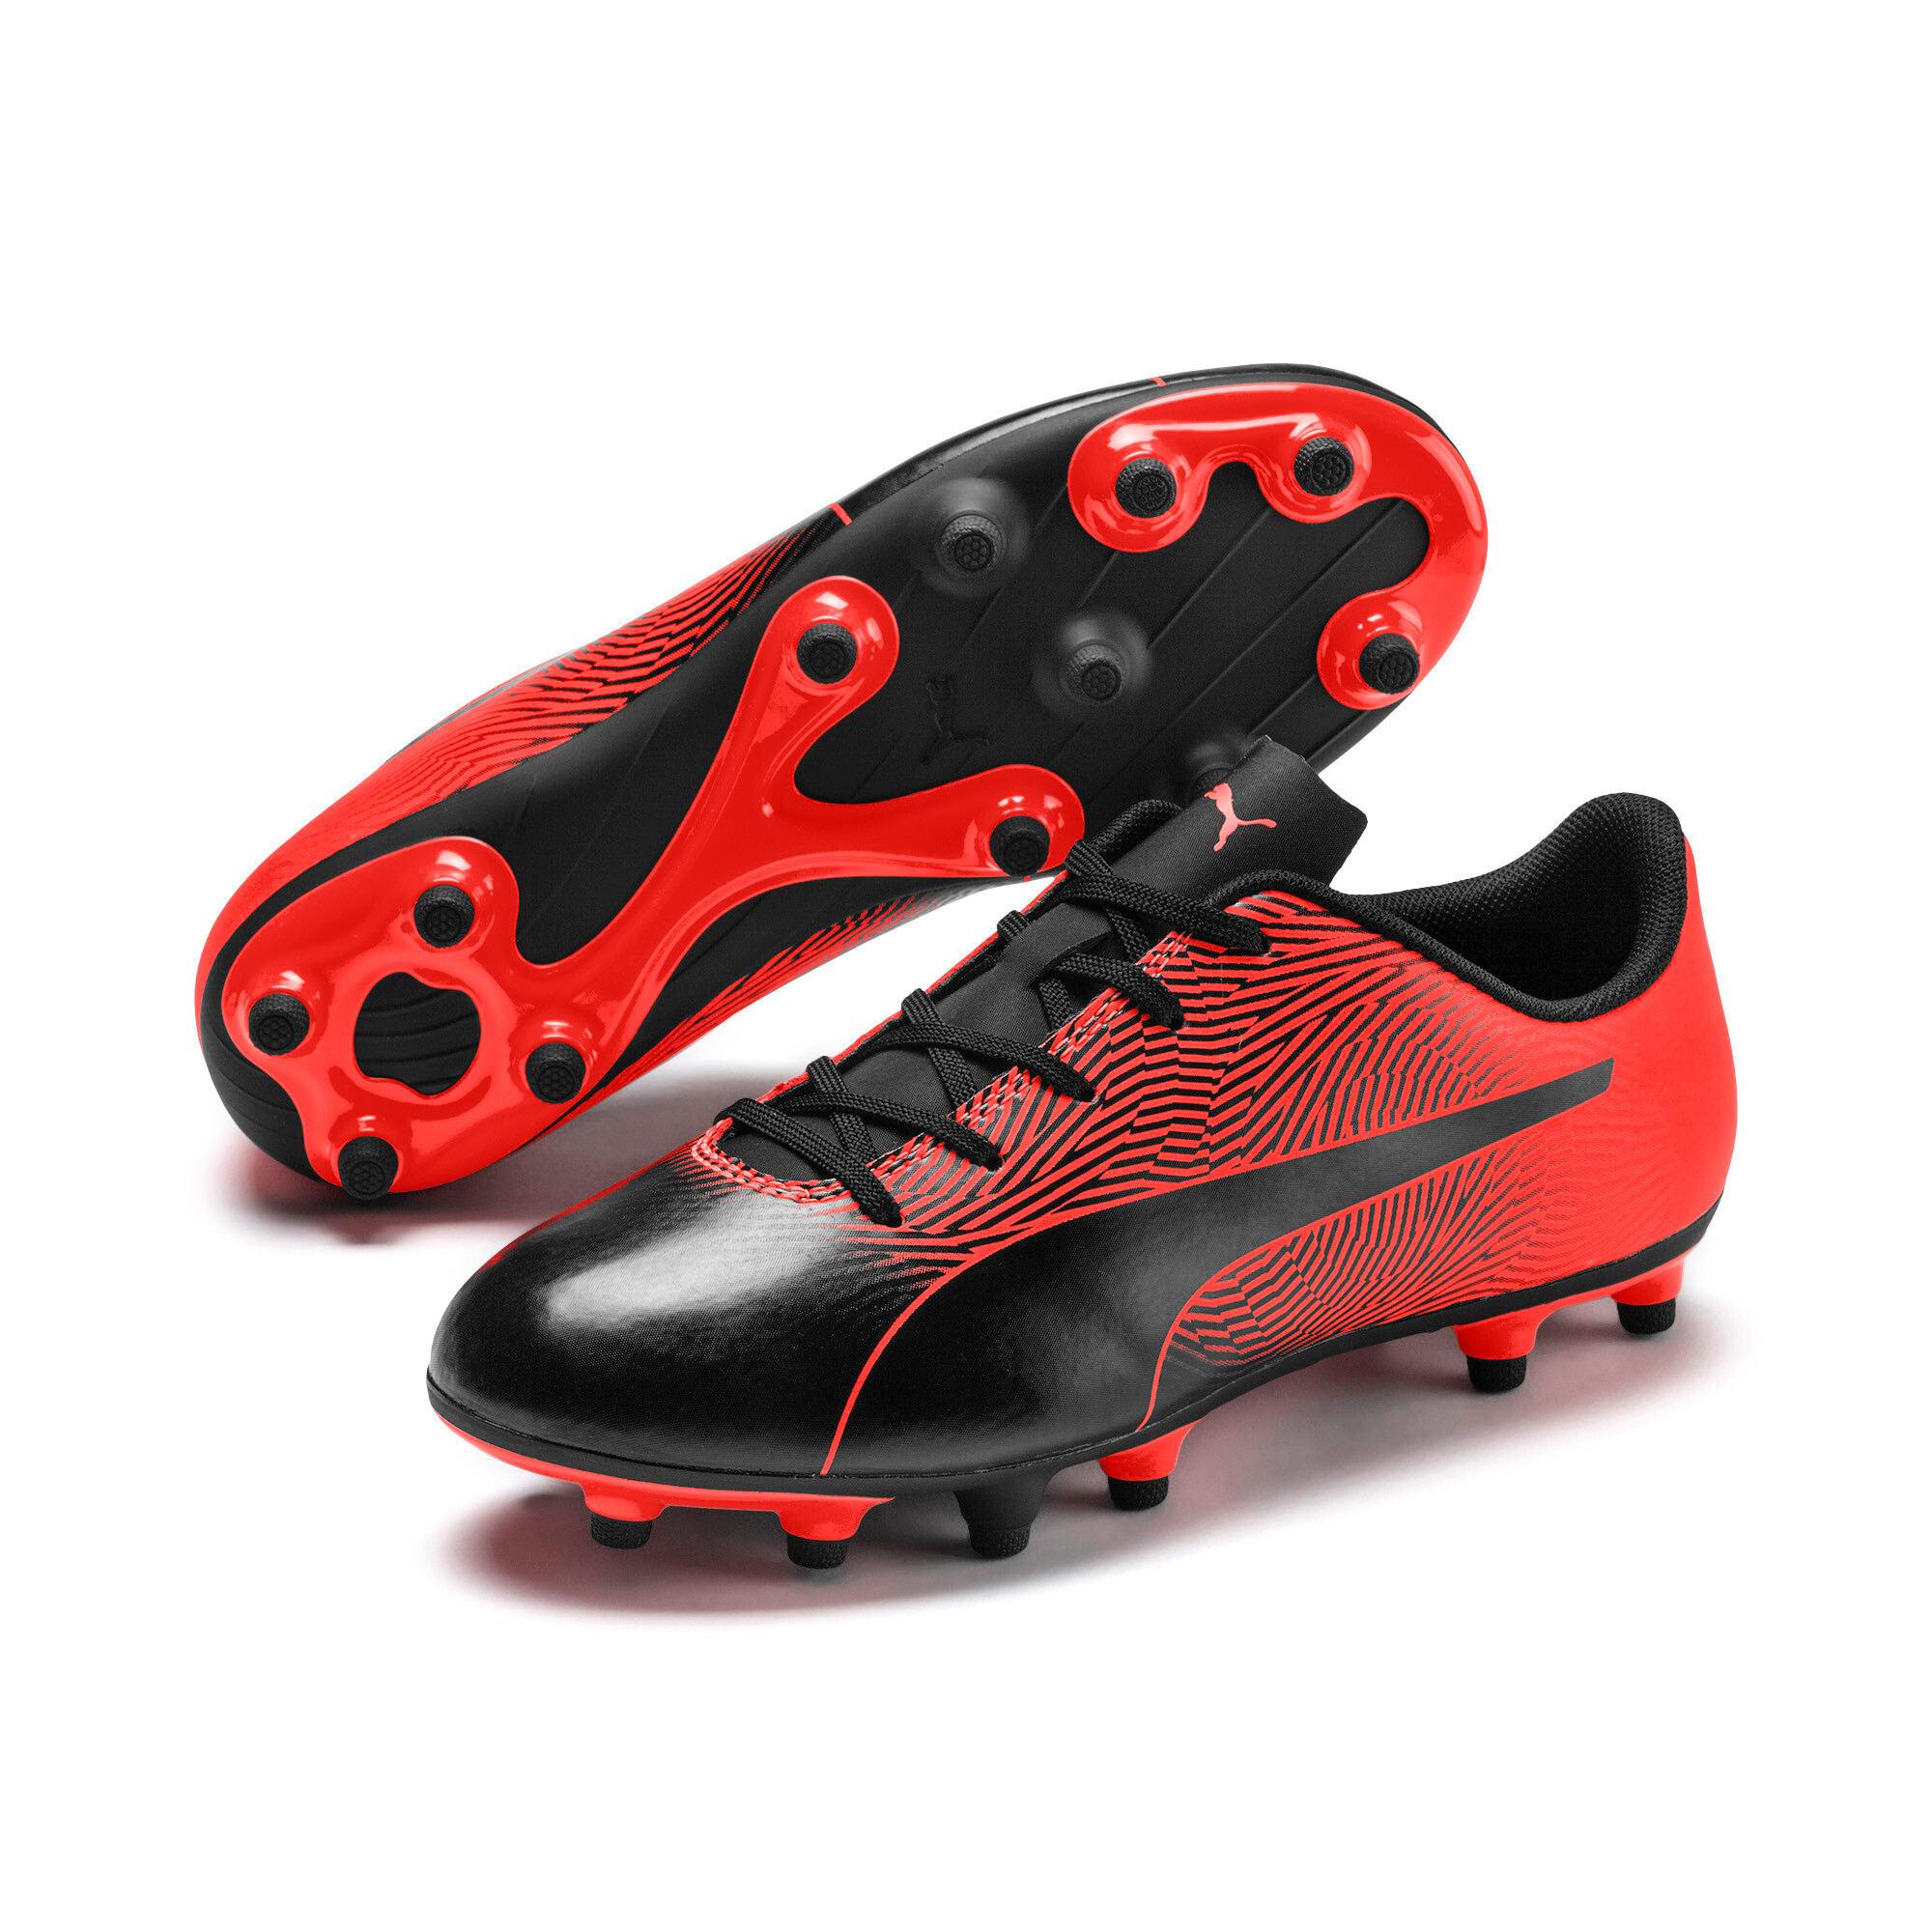 Thumbnail 6 of PUMA Spirit II FG Youth Football Boots, Puma Black-Nrgy Red, medium-IND